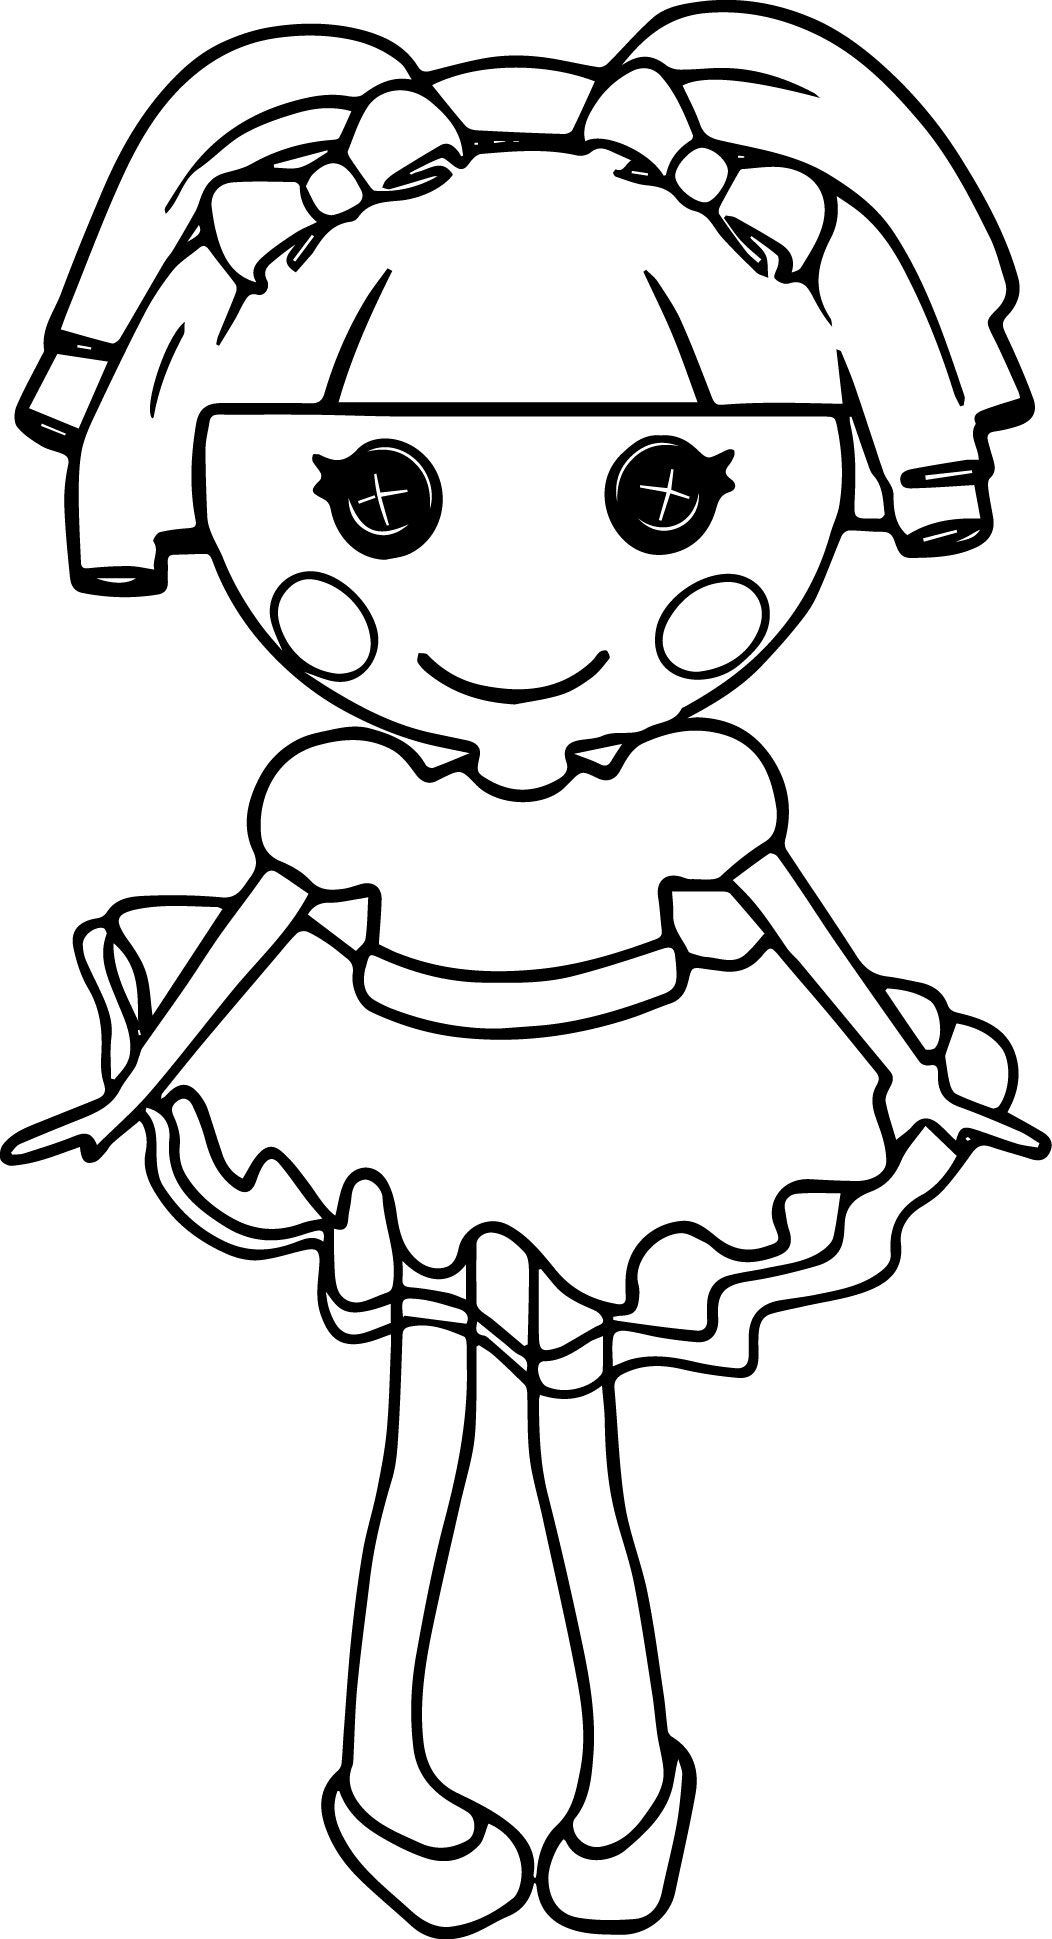 coloring pages lalaloopsy dolls lalaloopsy coloring pages getcoloringpagescom dolls lalaloopsy coloring pages